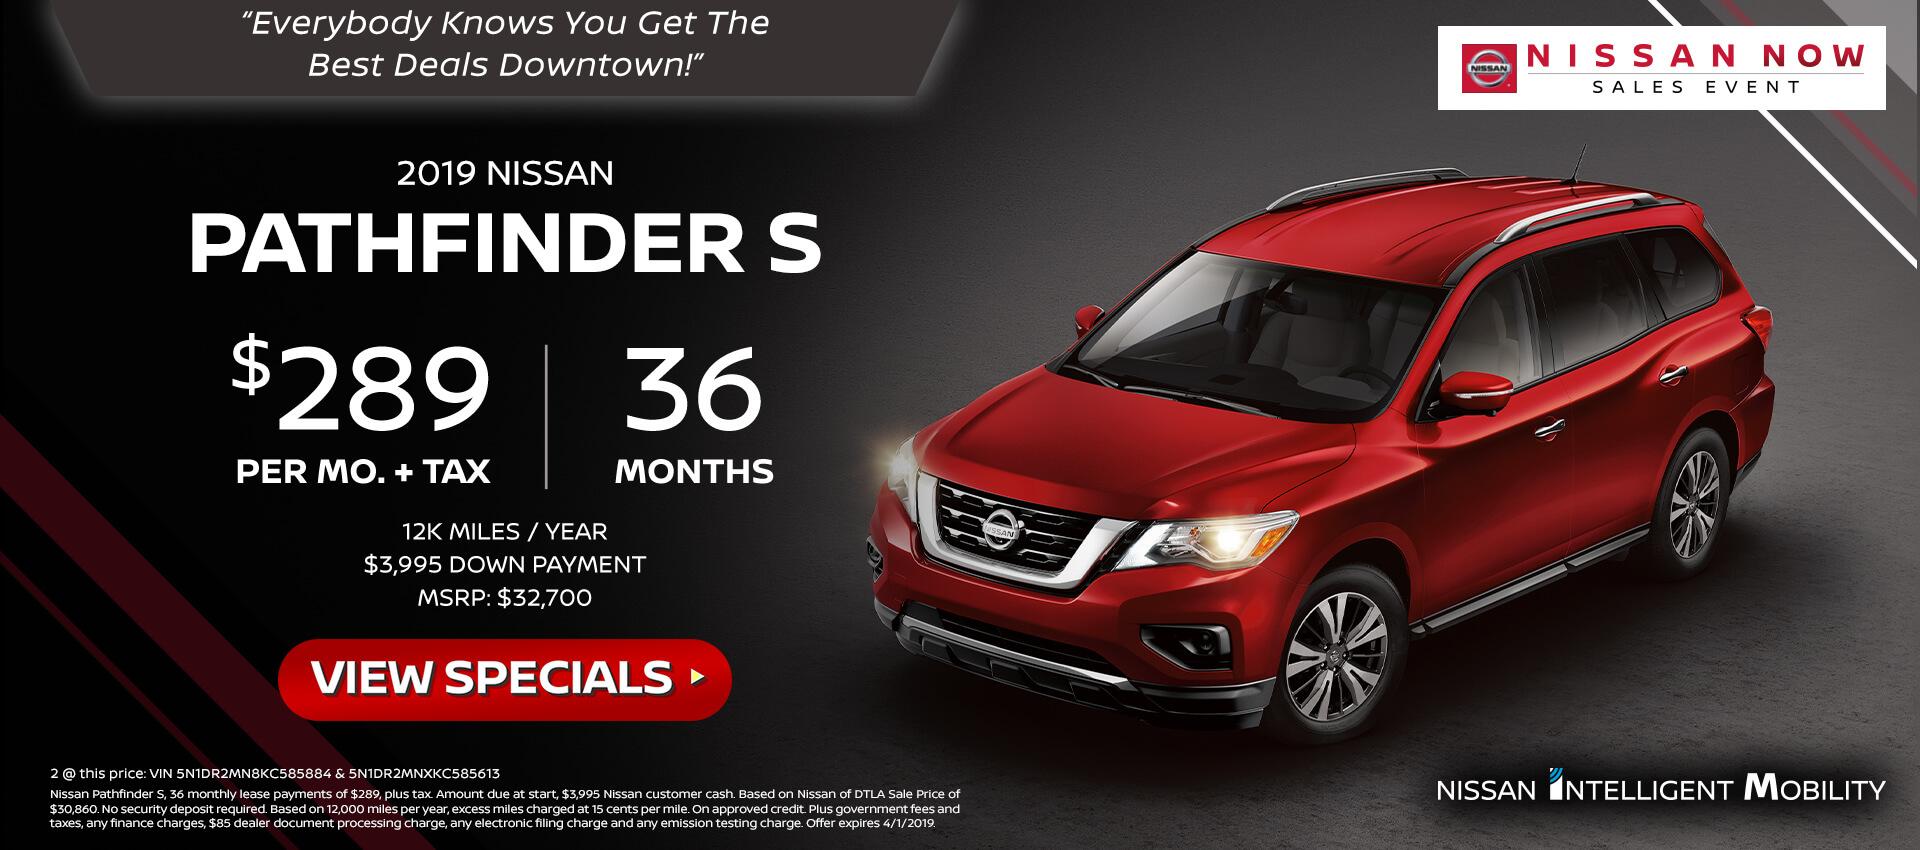 Pathfinder - lease offer